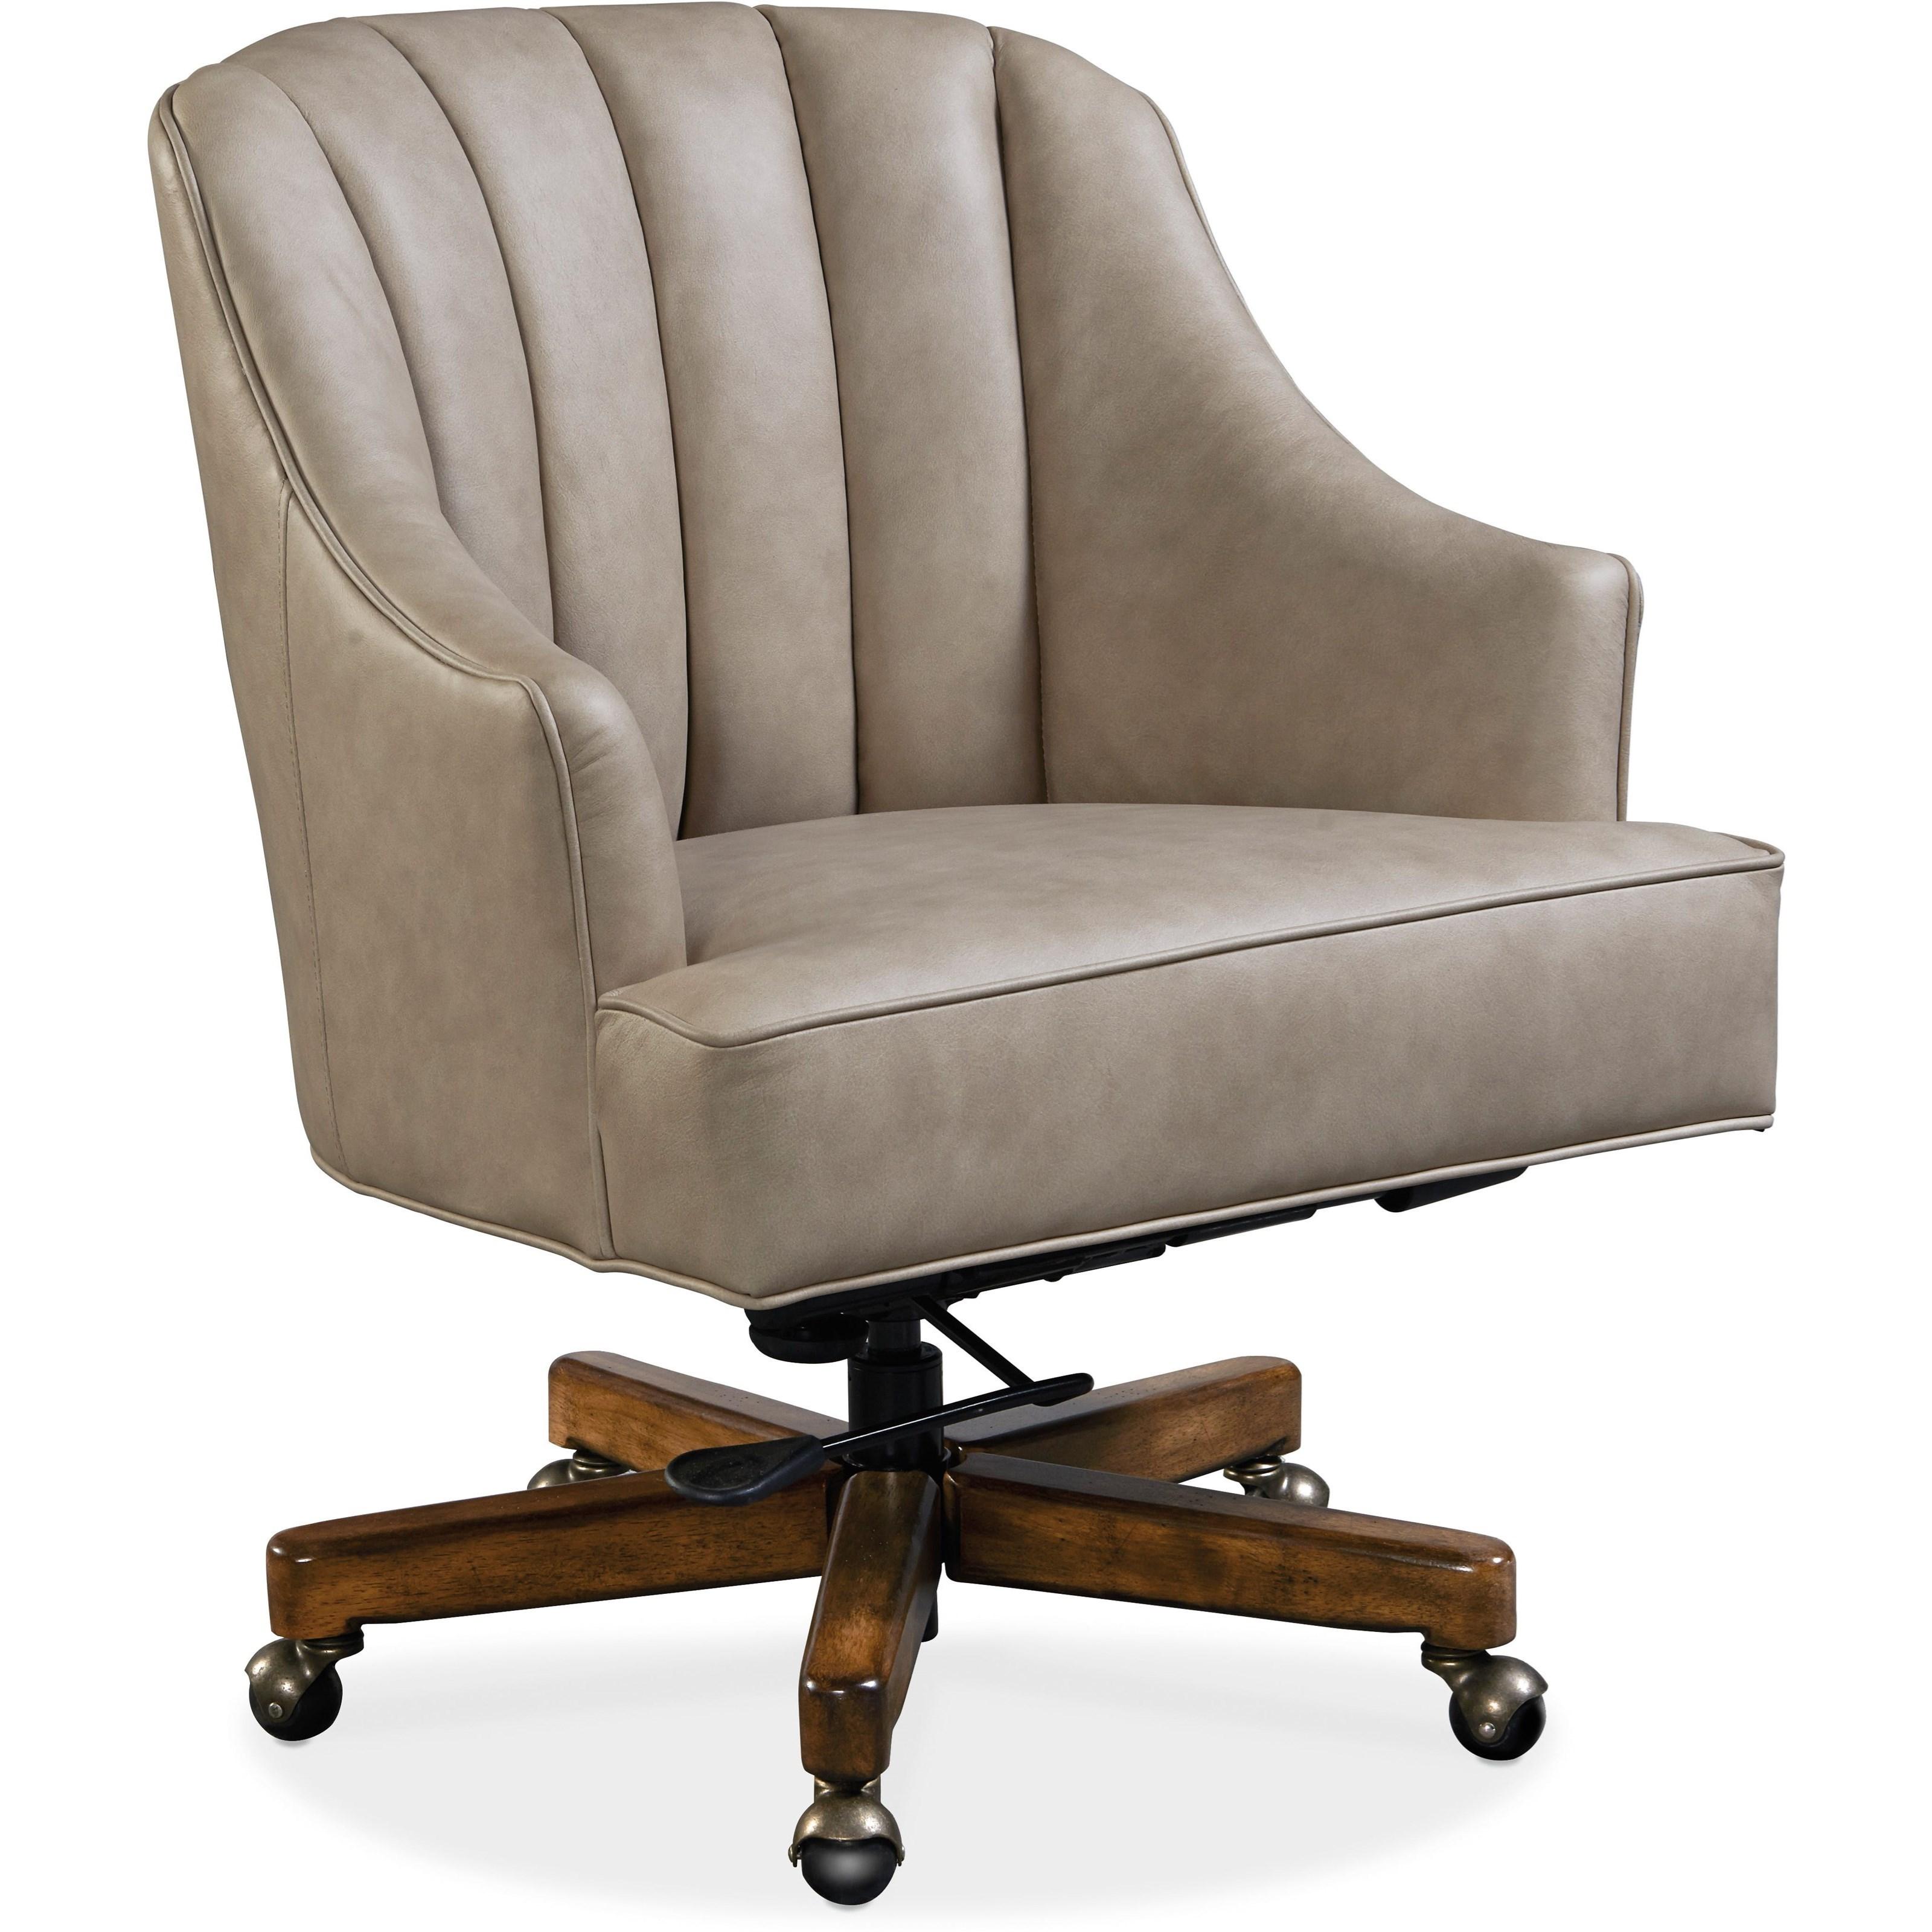 Transitional Executive Swivel Tilt Chair